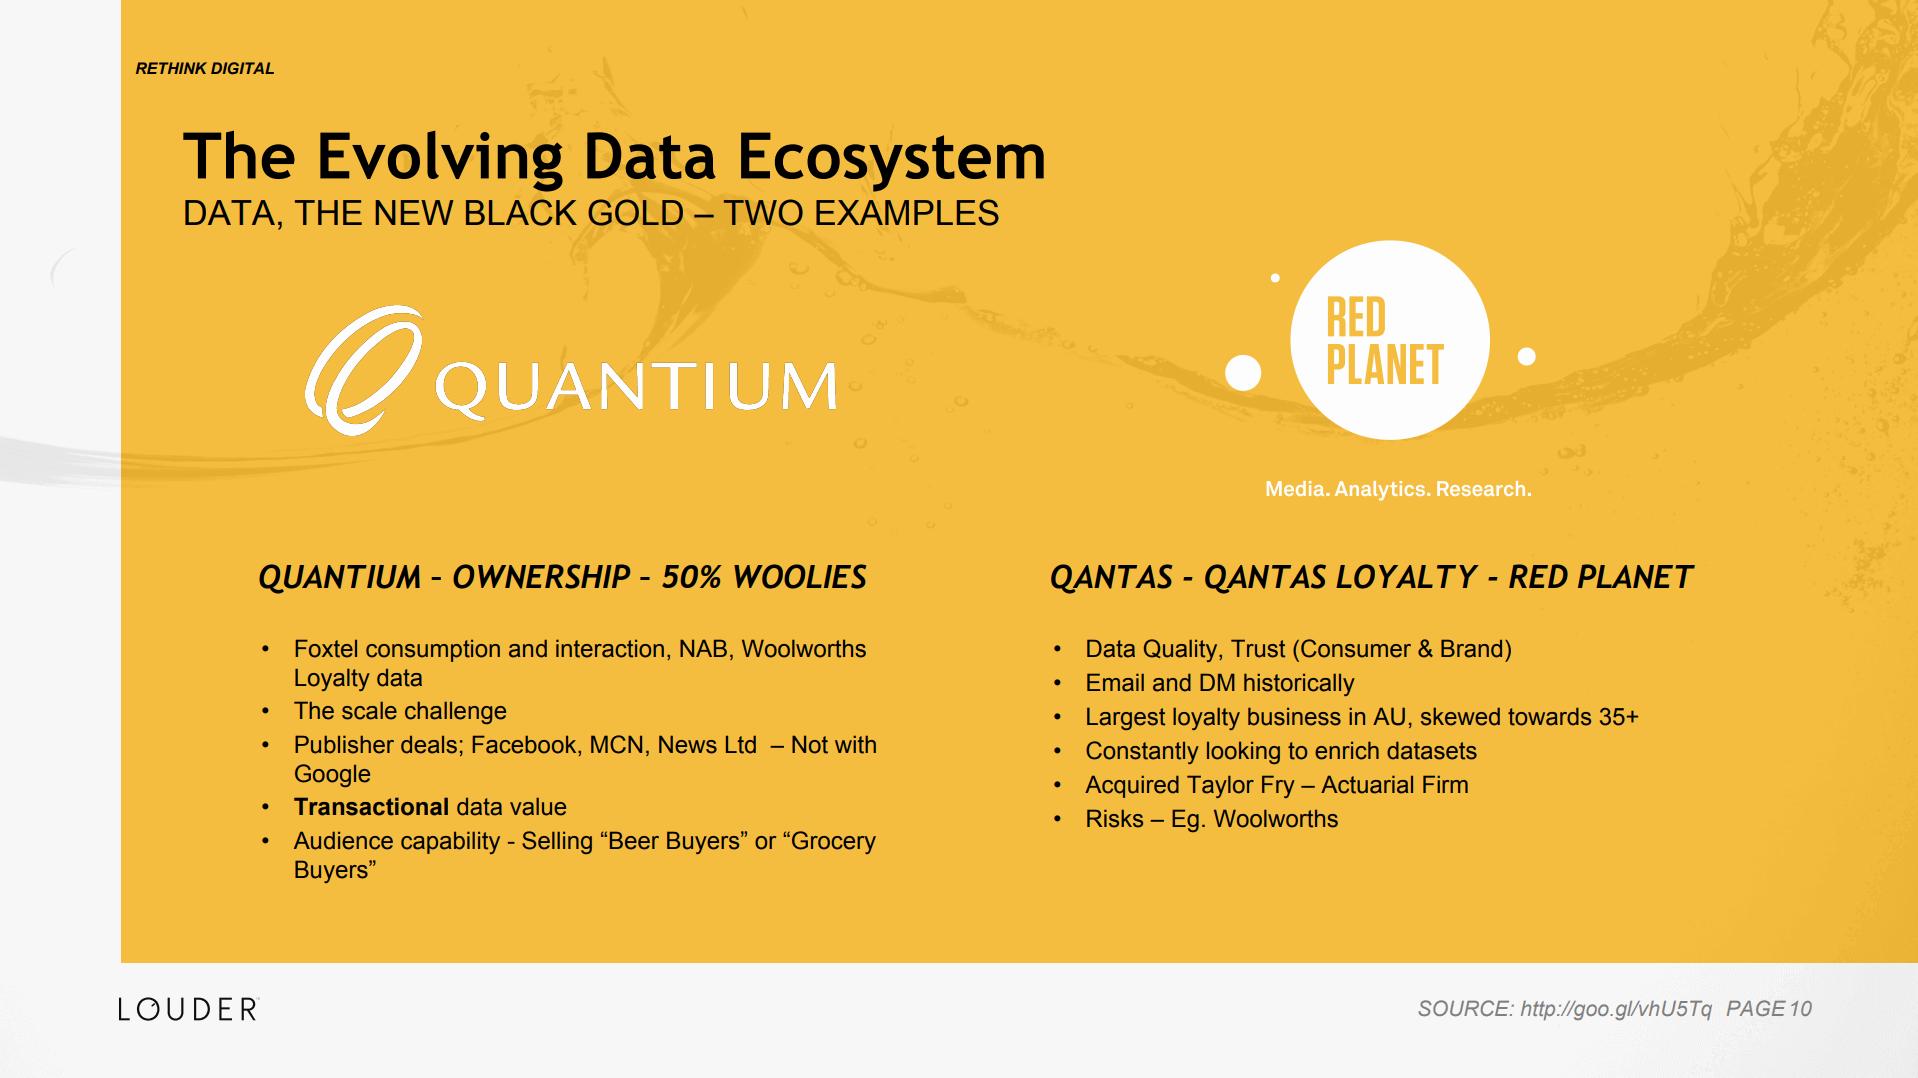 The Evolving Data Ecosystem